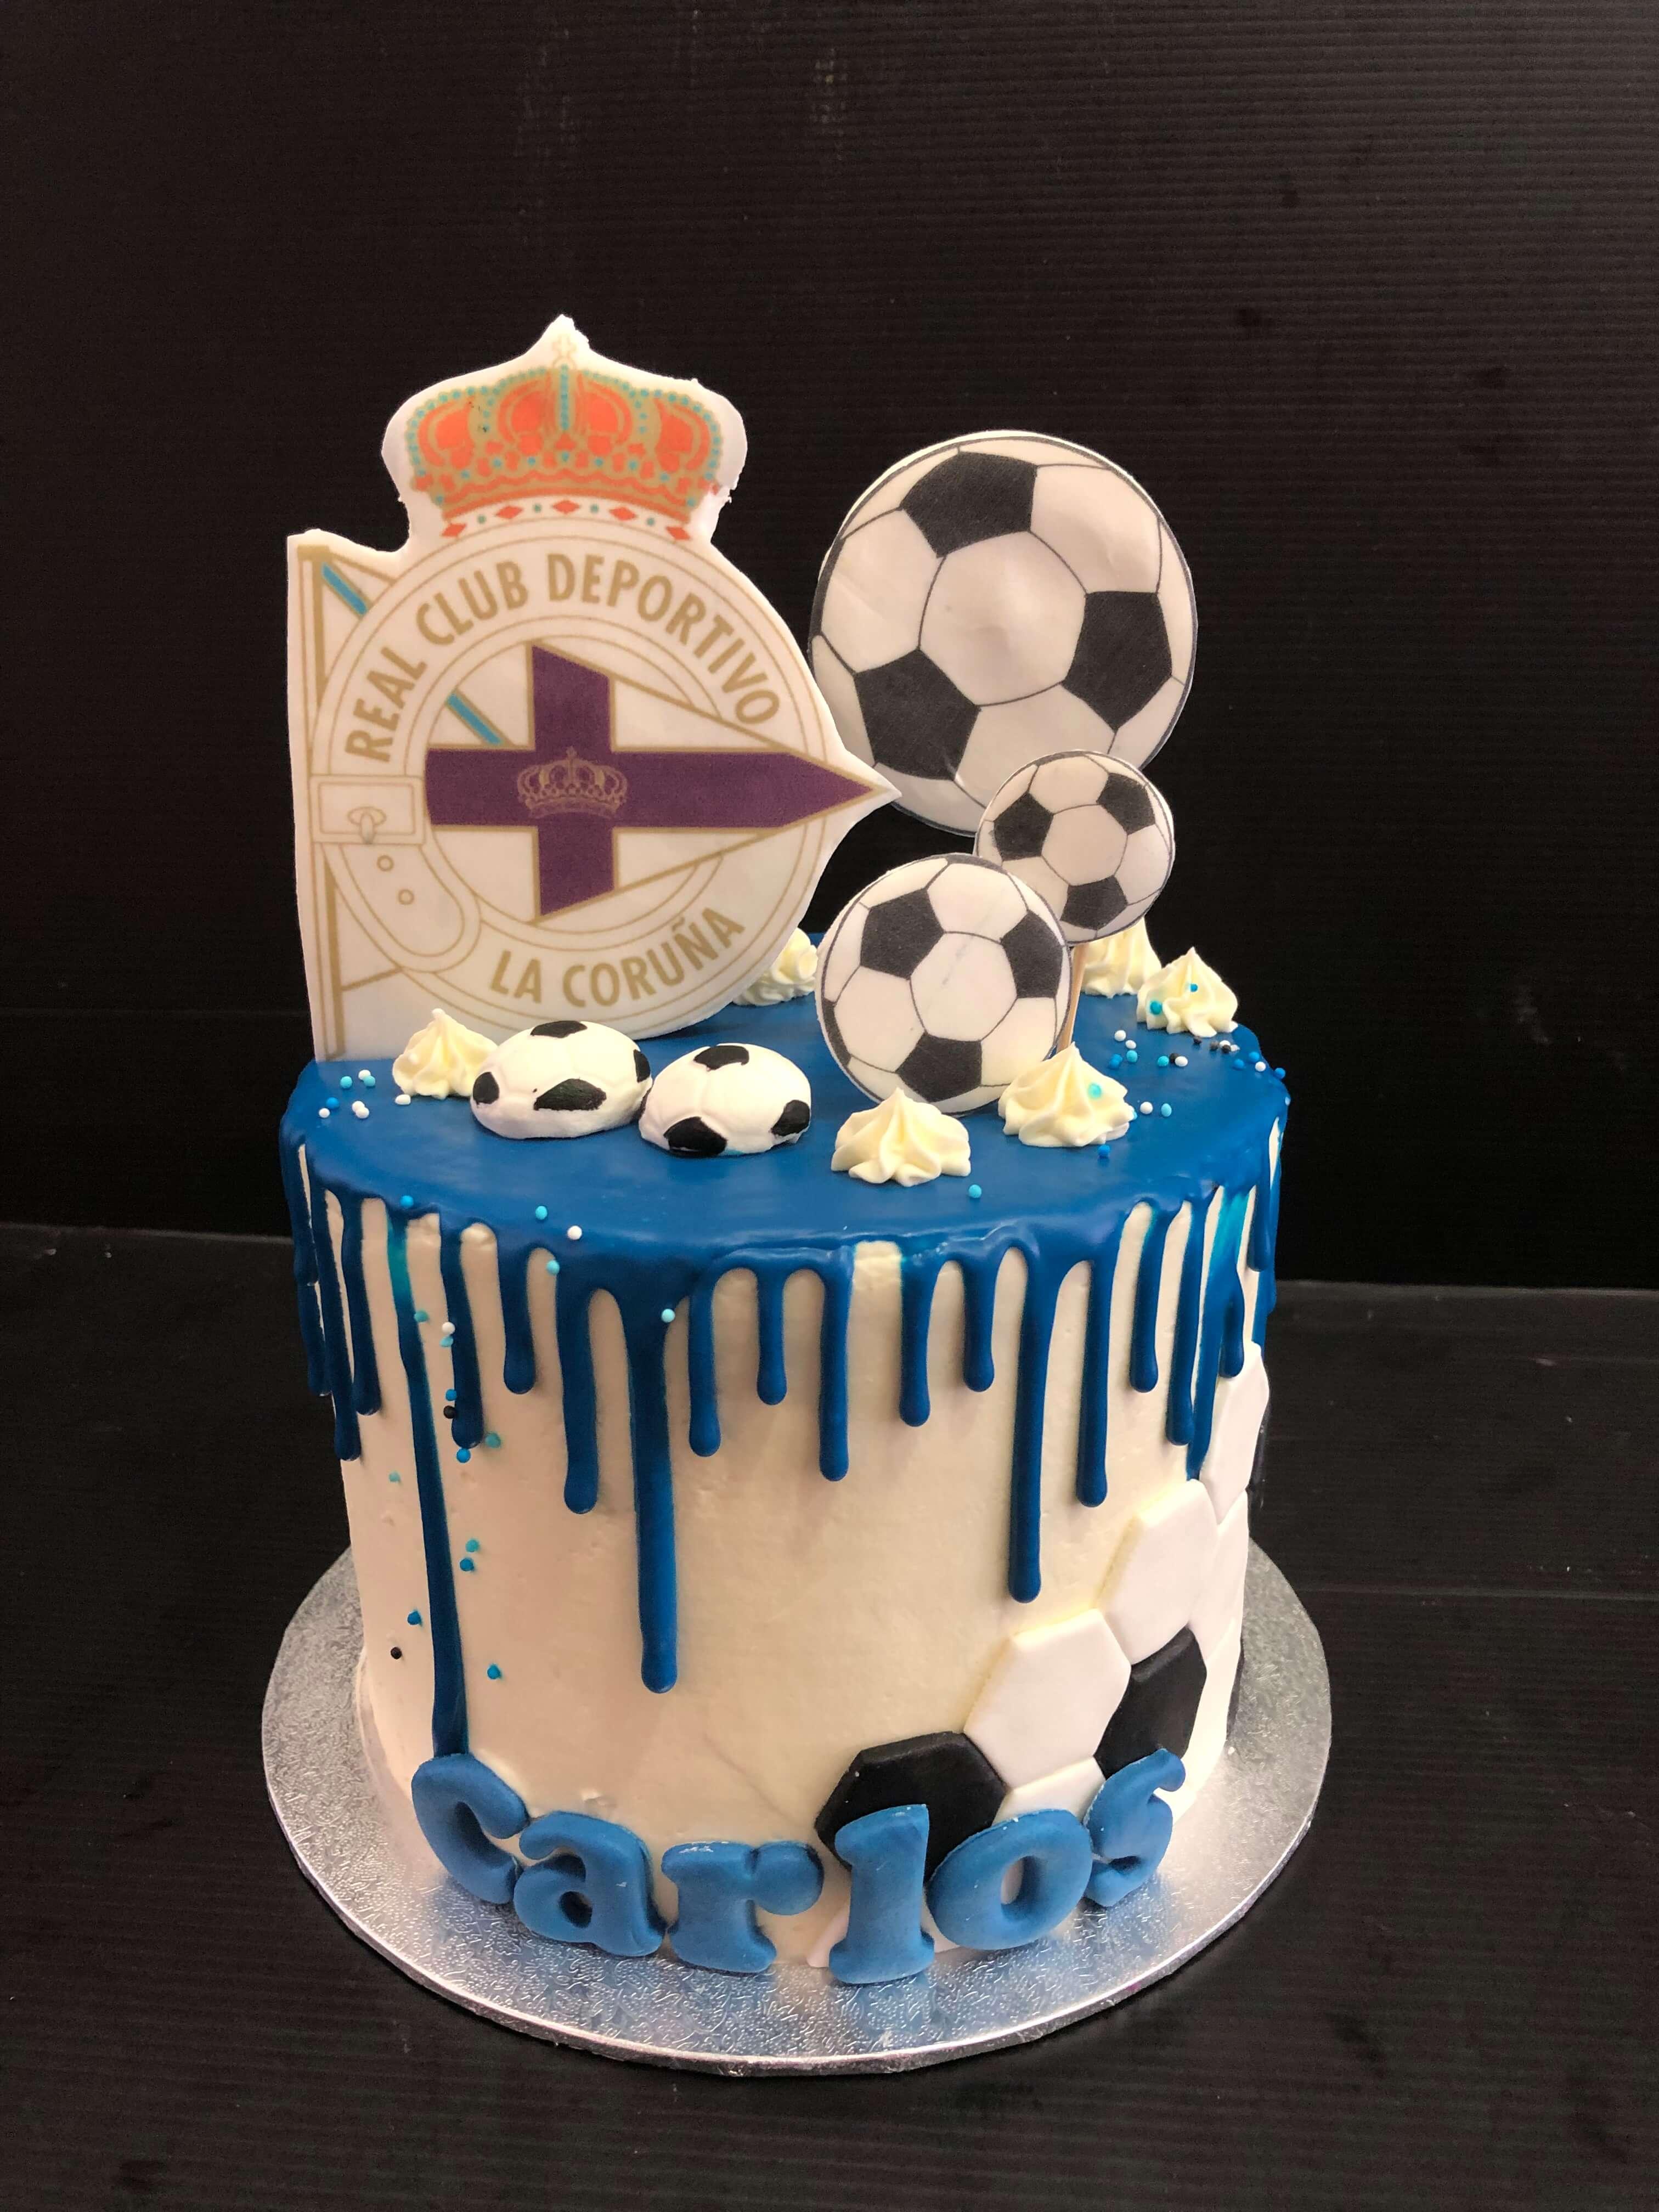 tarta cumpleaños deportivo coruña depor